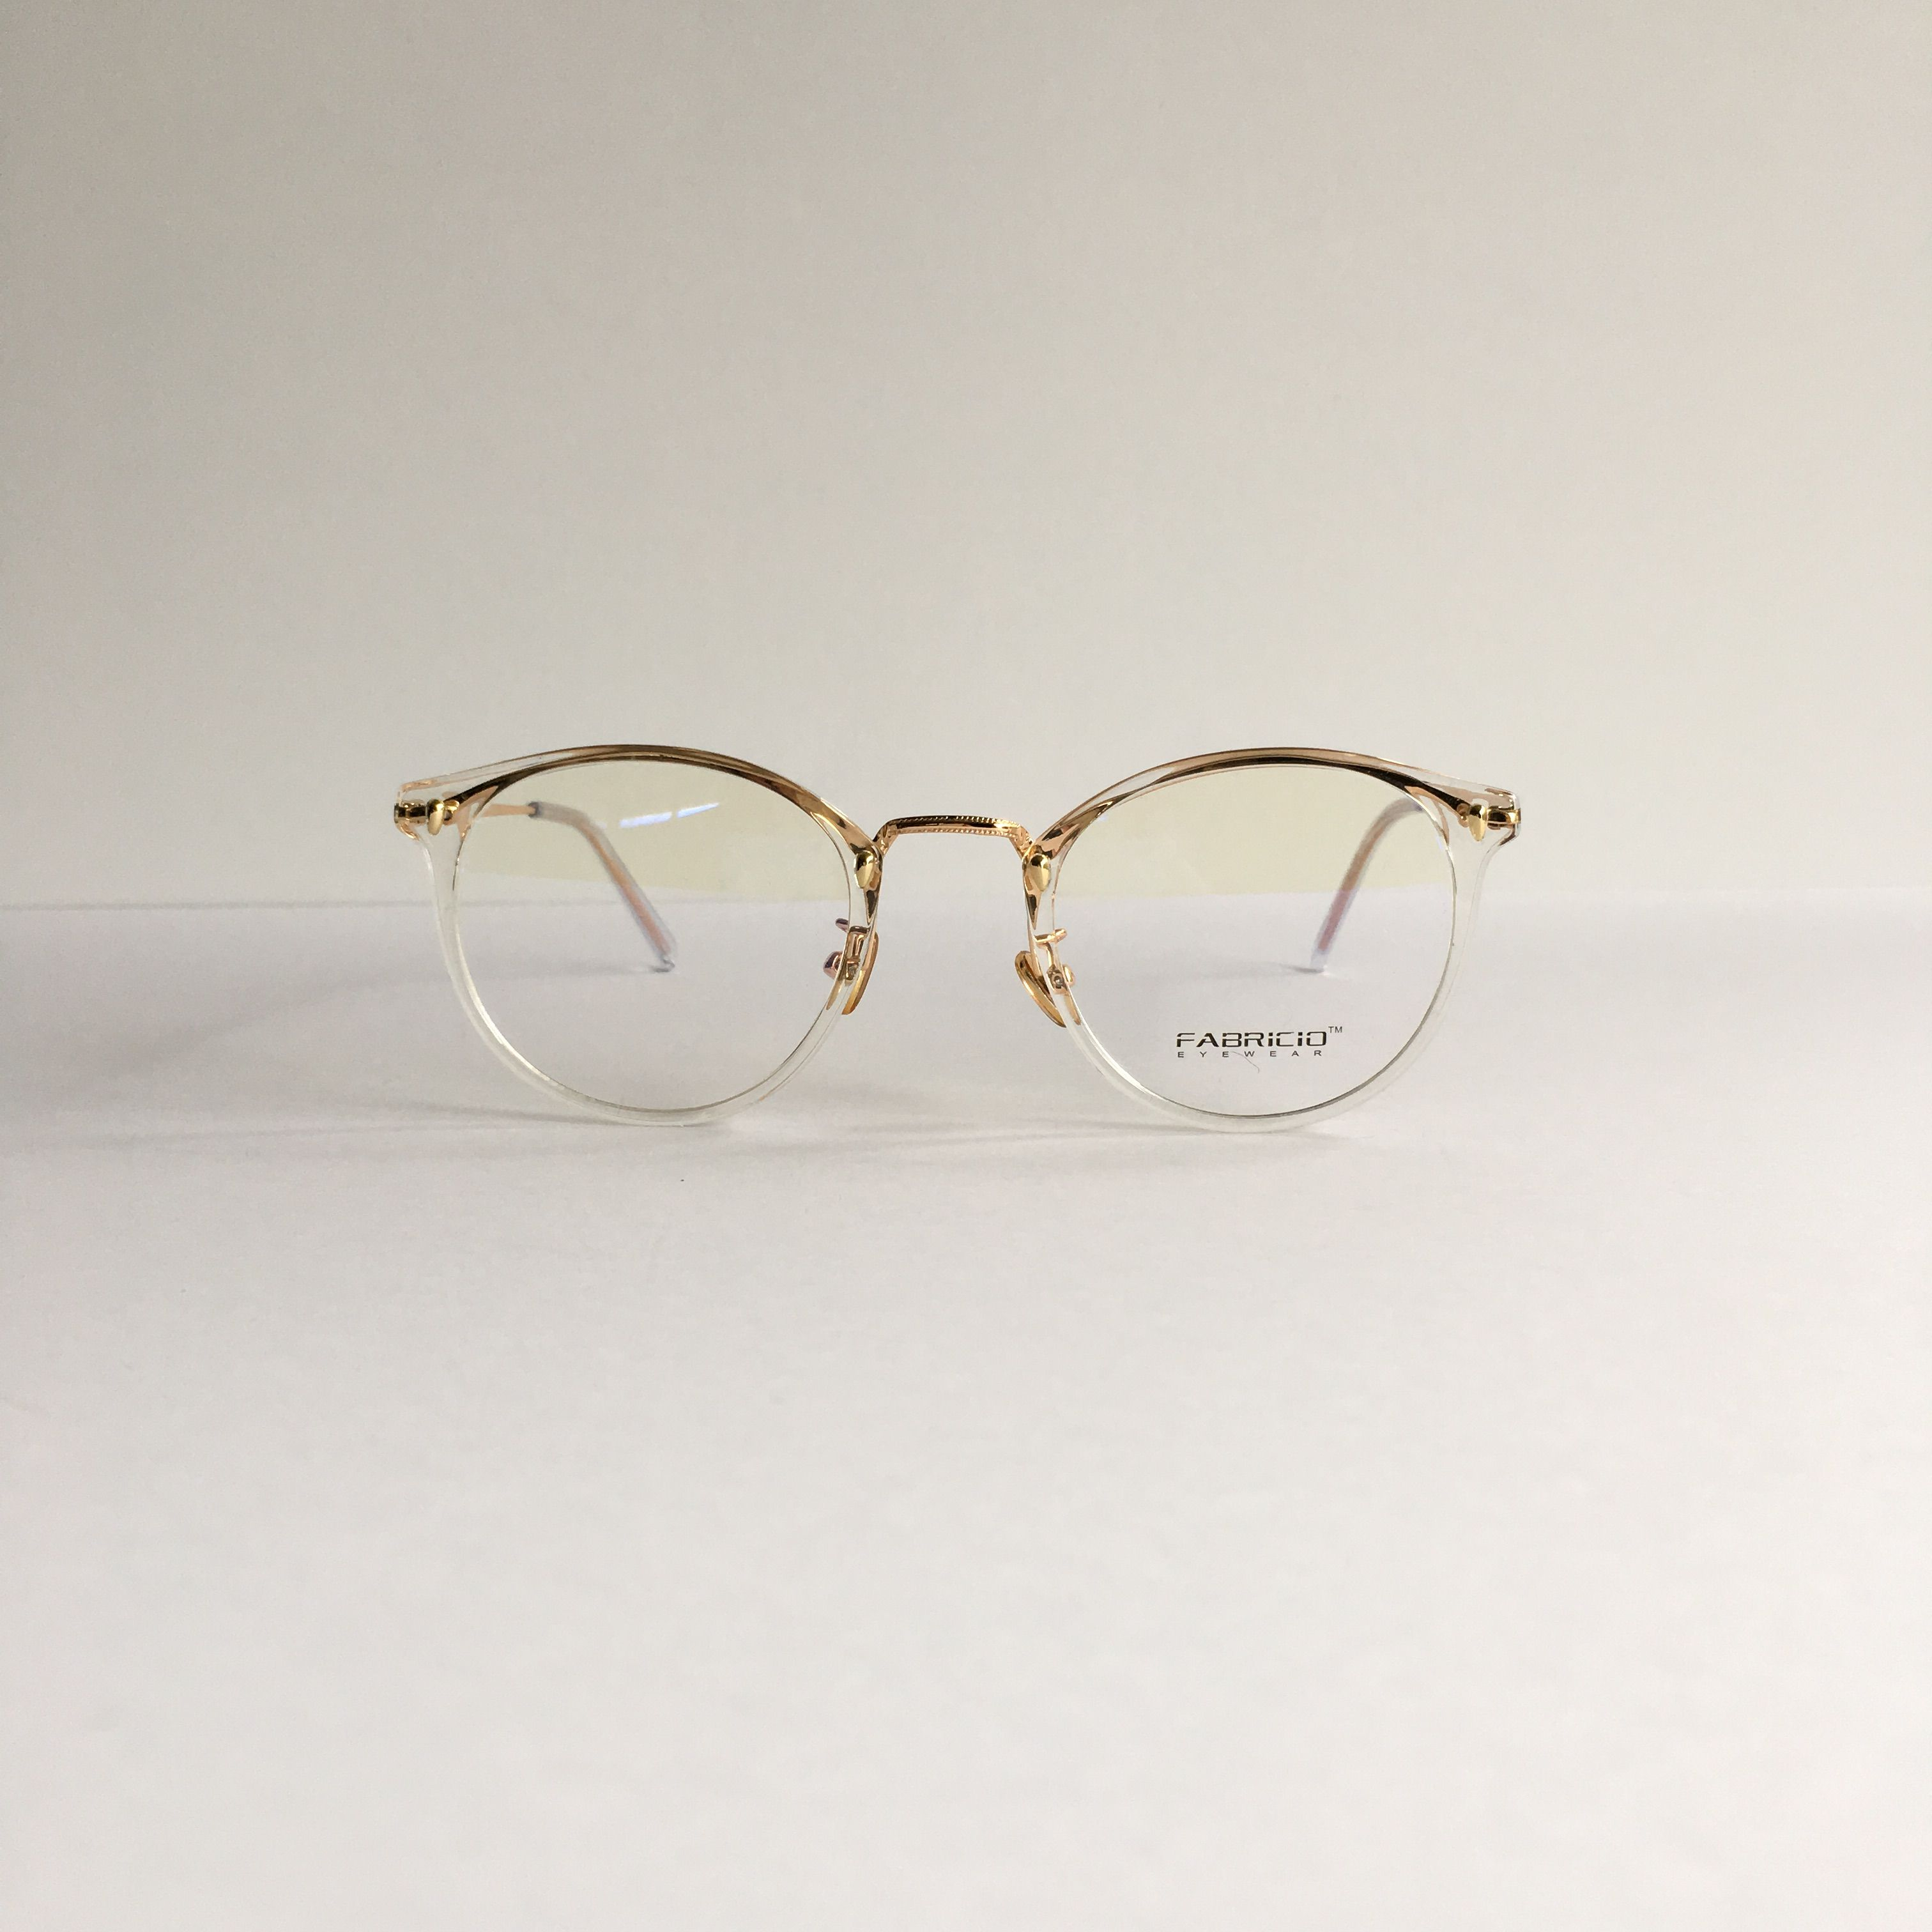 vision spirit news s eyewear jaguar industry optical ic c feed e style